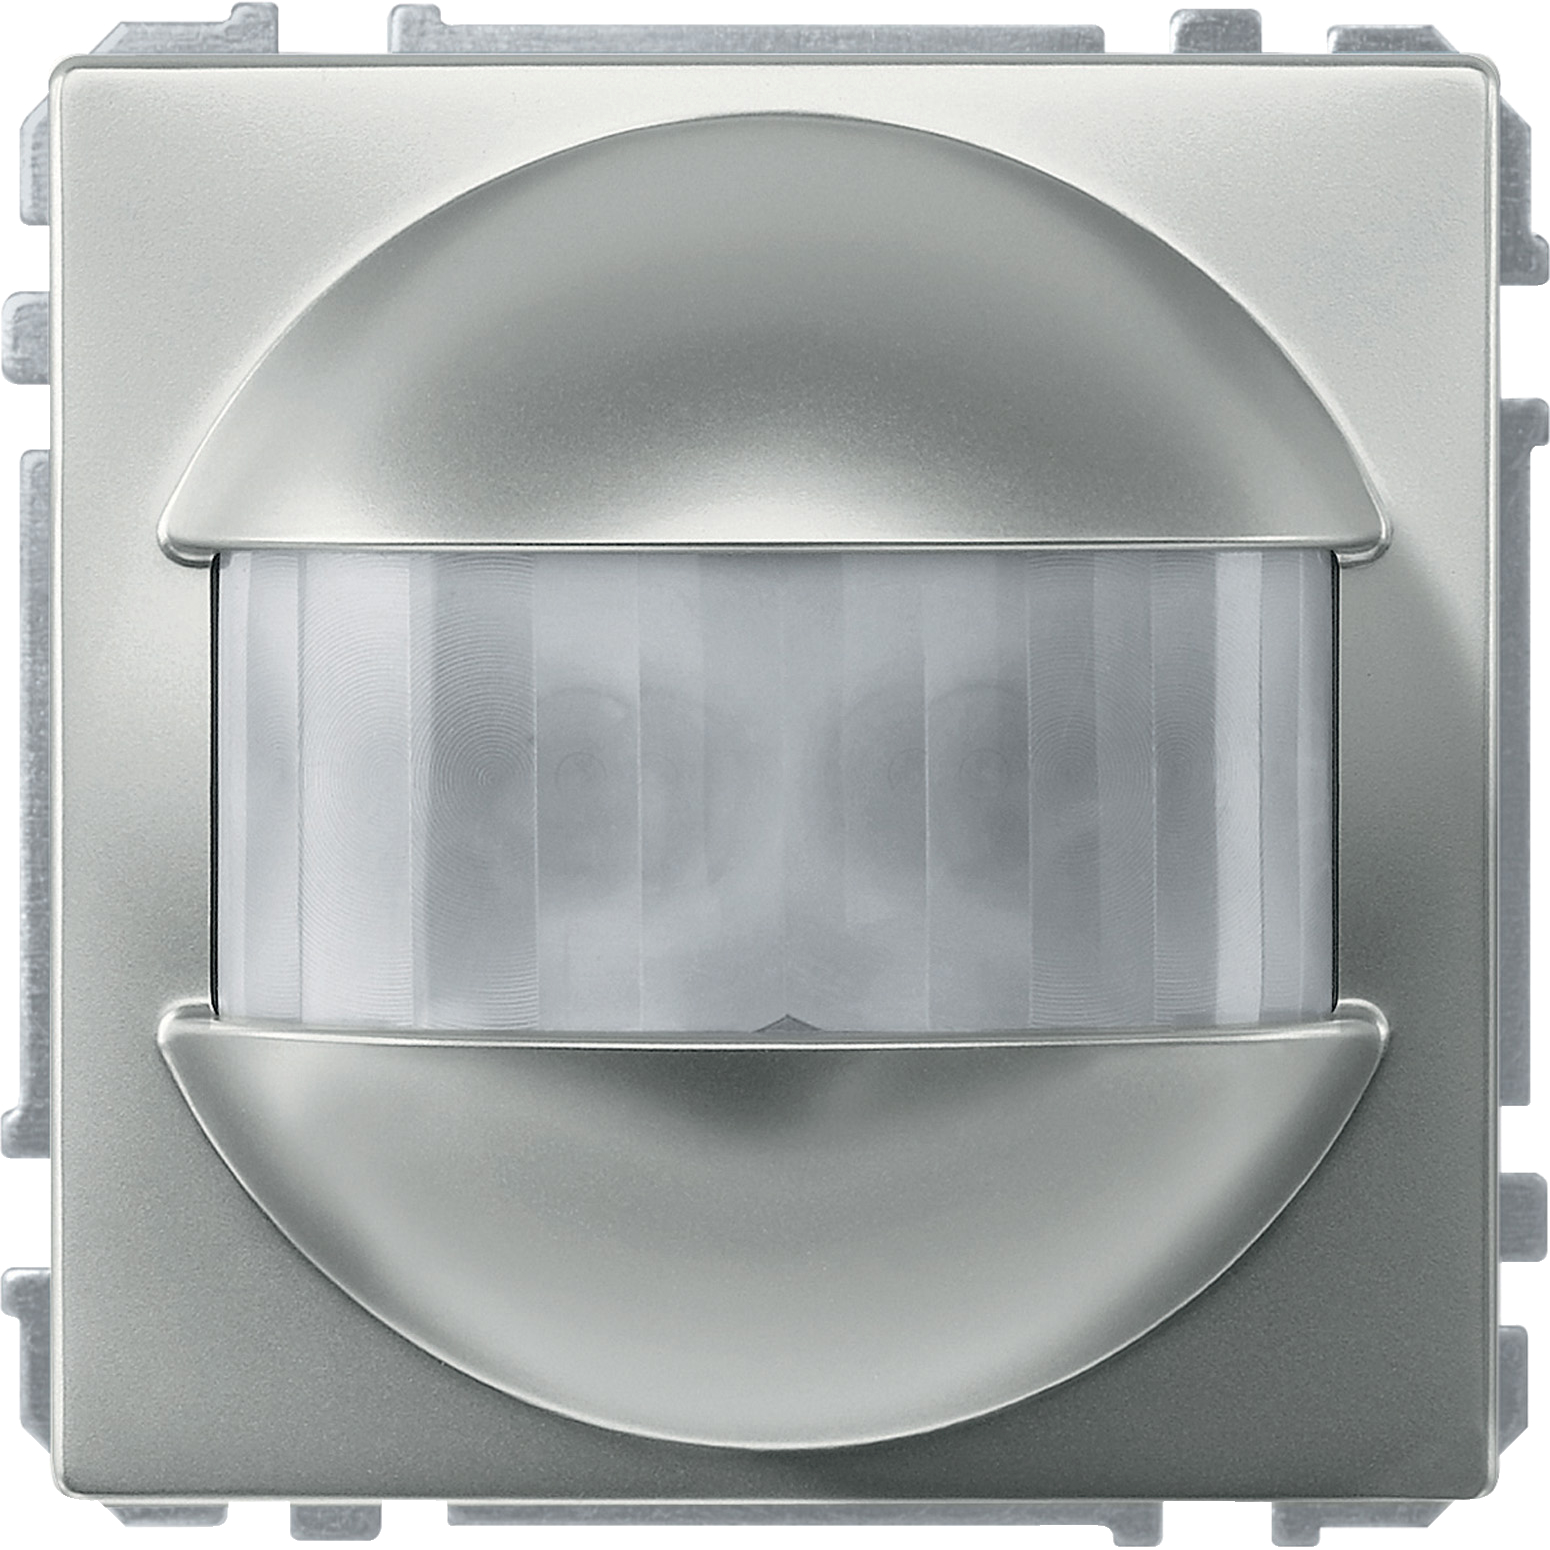 Image Description for https://tedi.itc-electronics.com/itcmedia/images/20190426/MTN631846_SCHNEIDERELECTRIC_1.jpeg